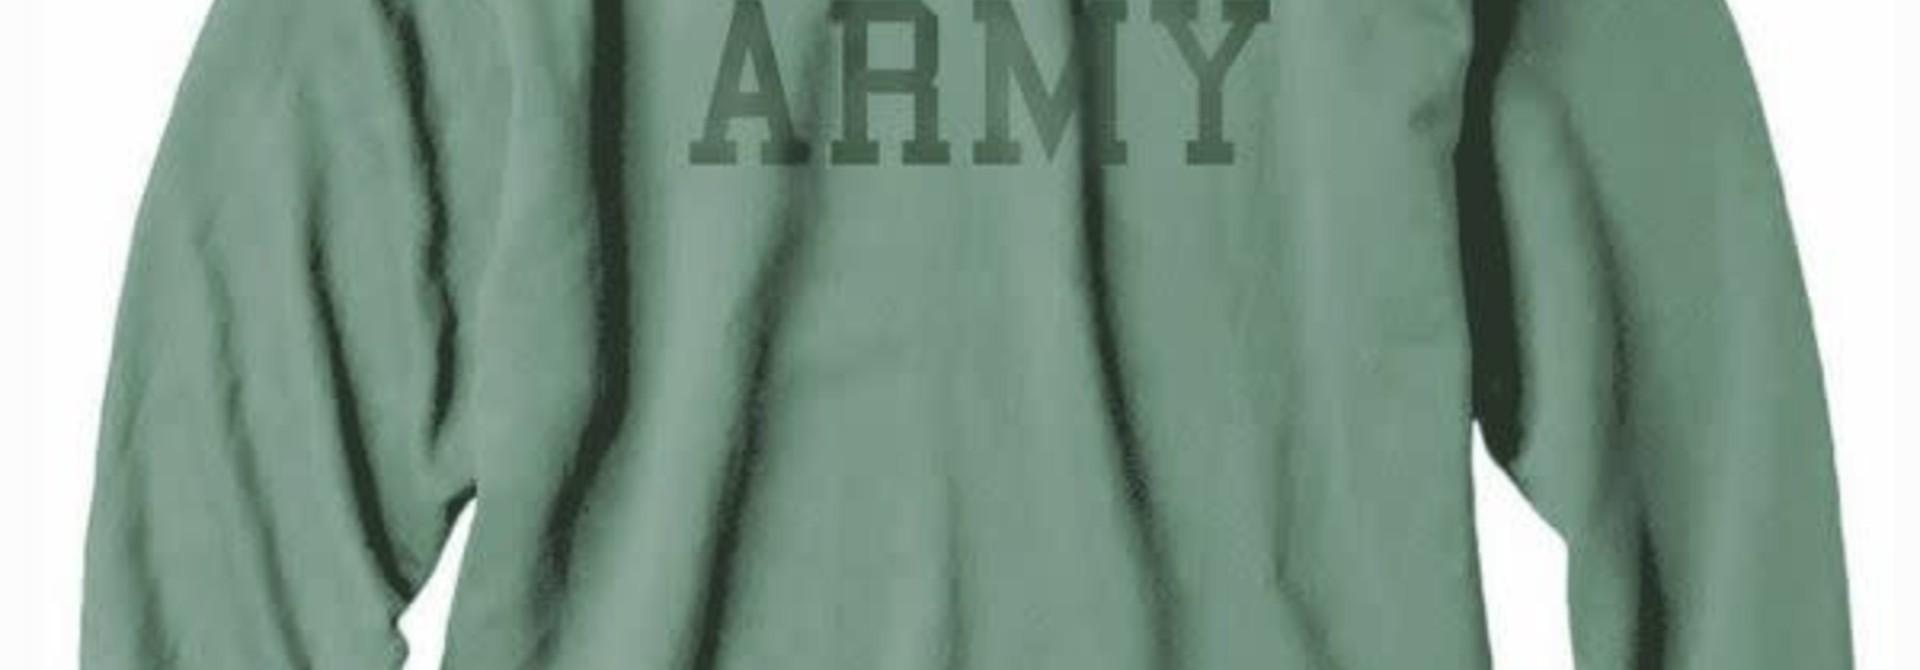 Army Collegiate Sweatshirt, Green